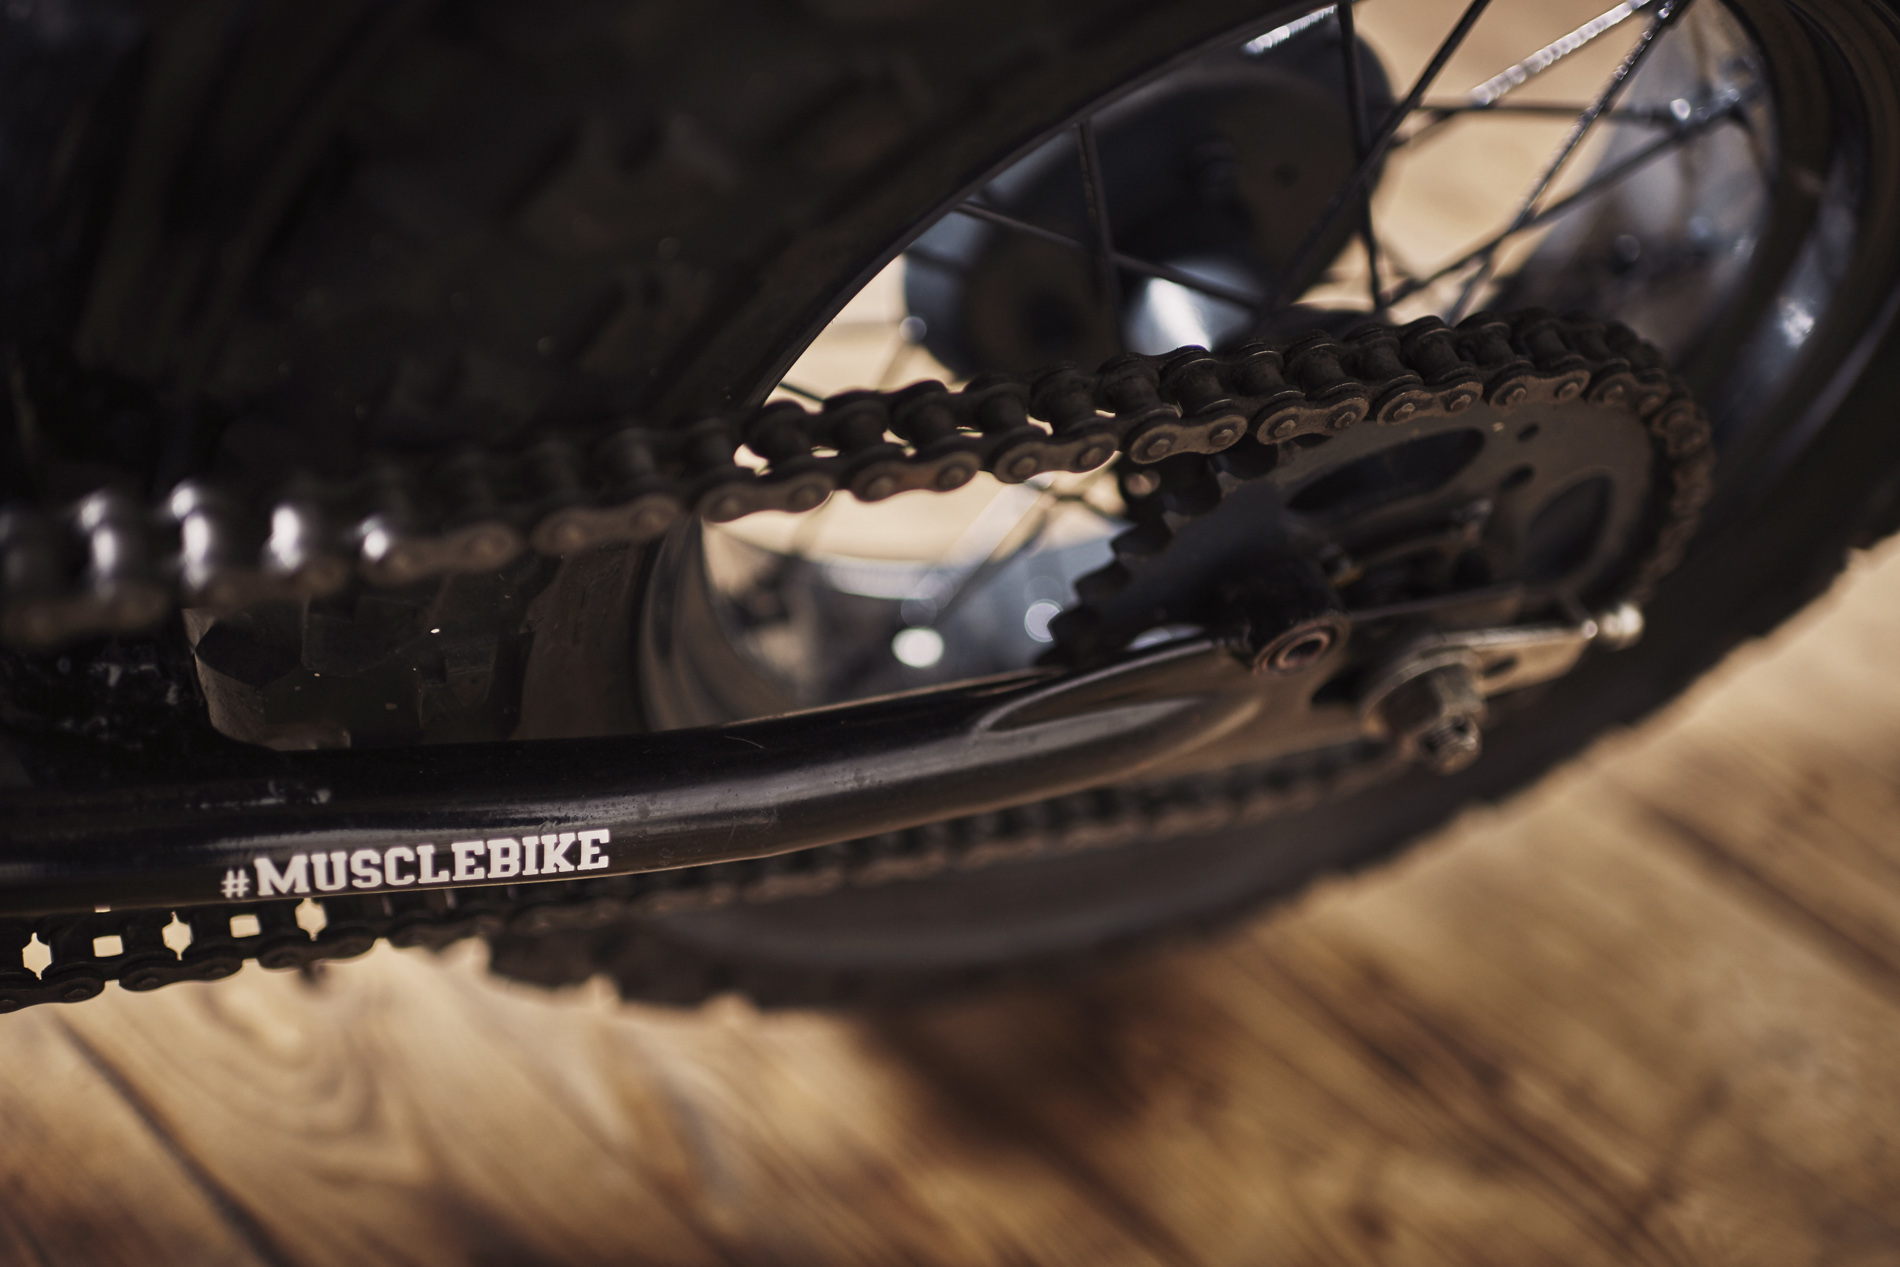 Musclebike for McFit